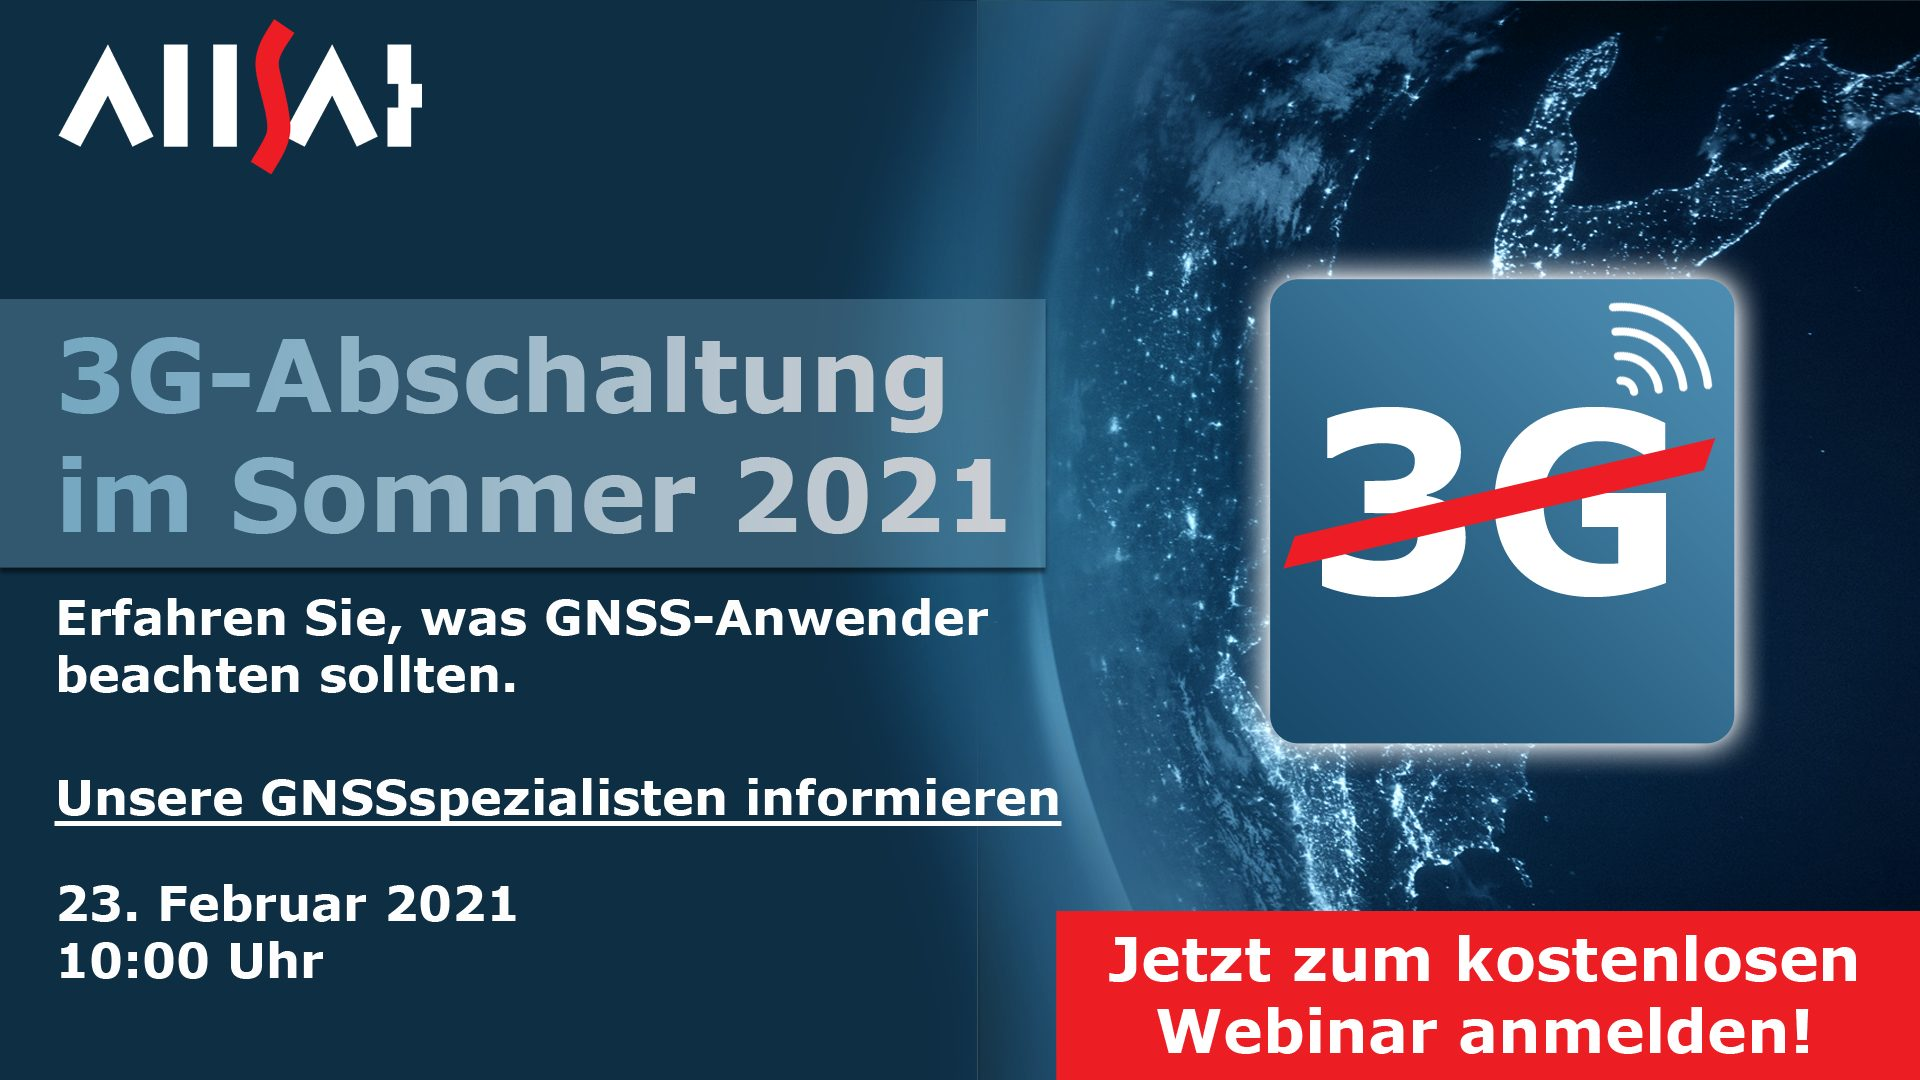 ALLSAT Veranstaltungen: Webinar 3-G Abschaltung